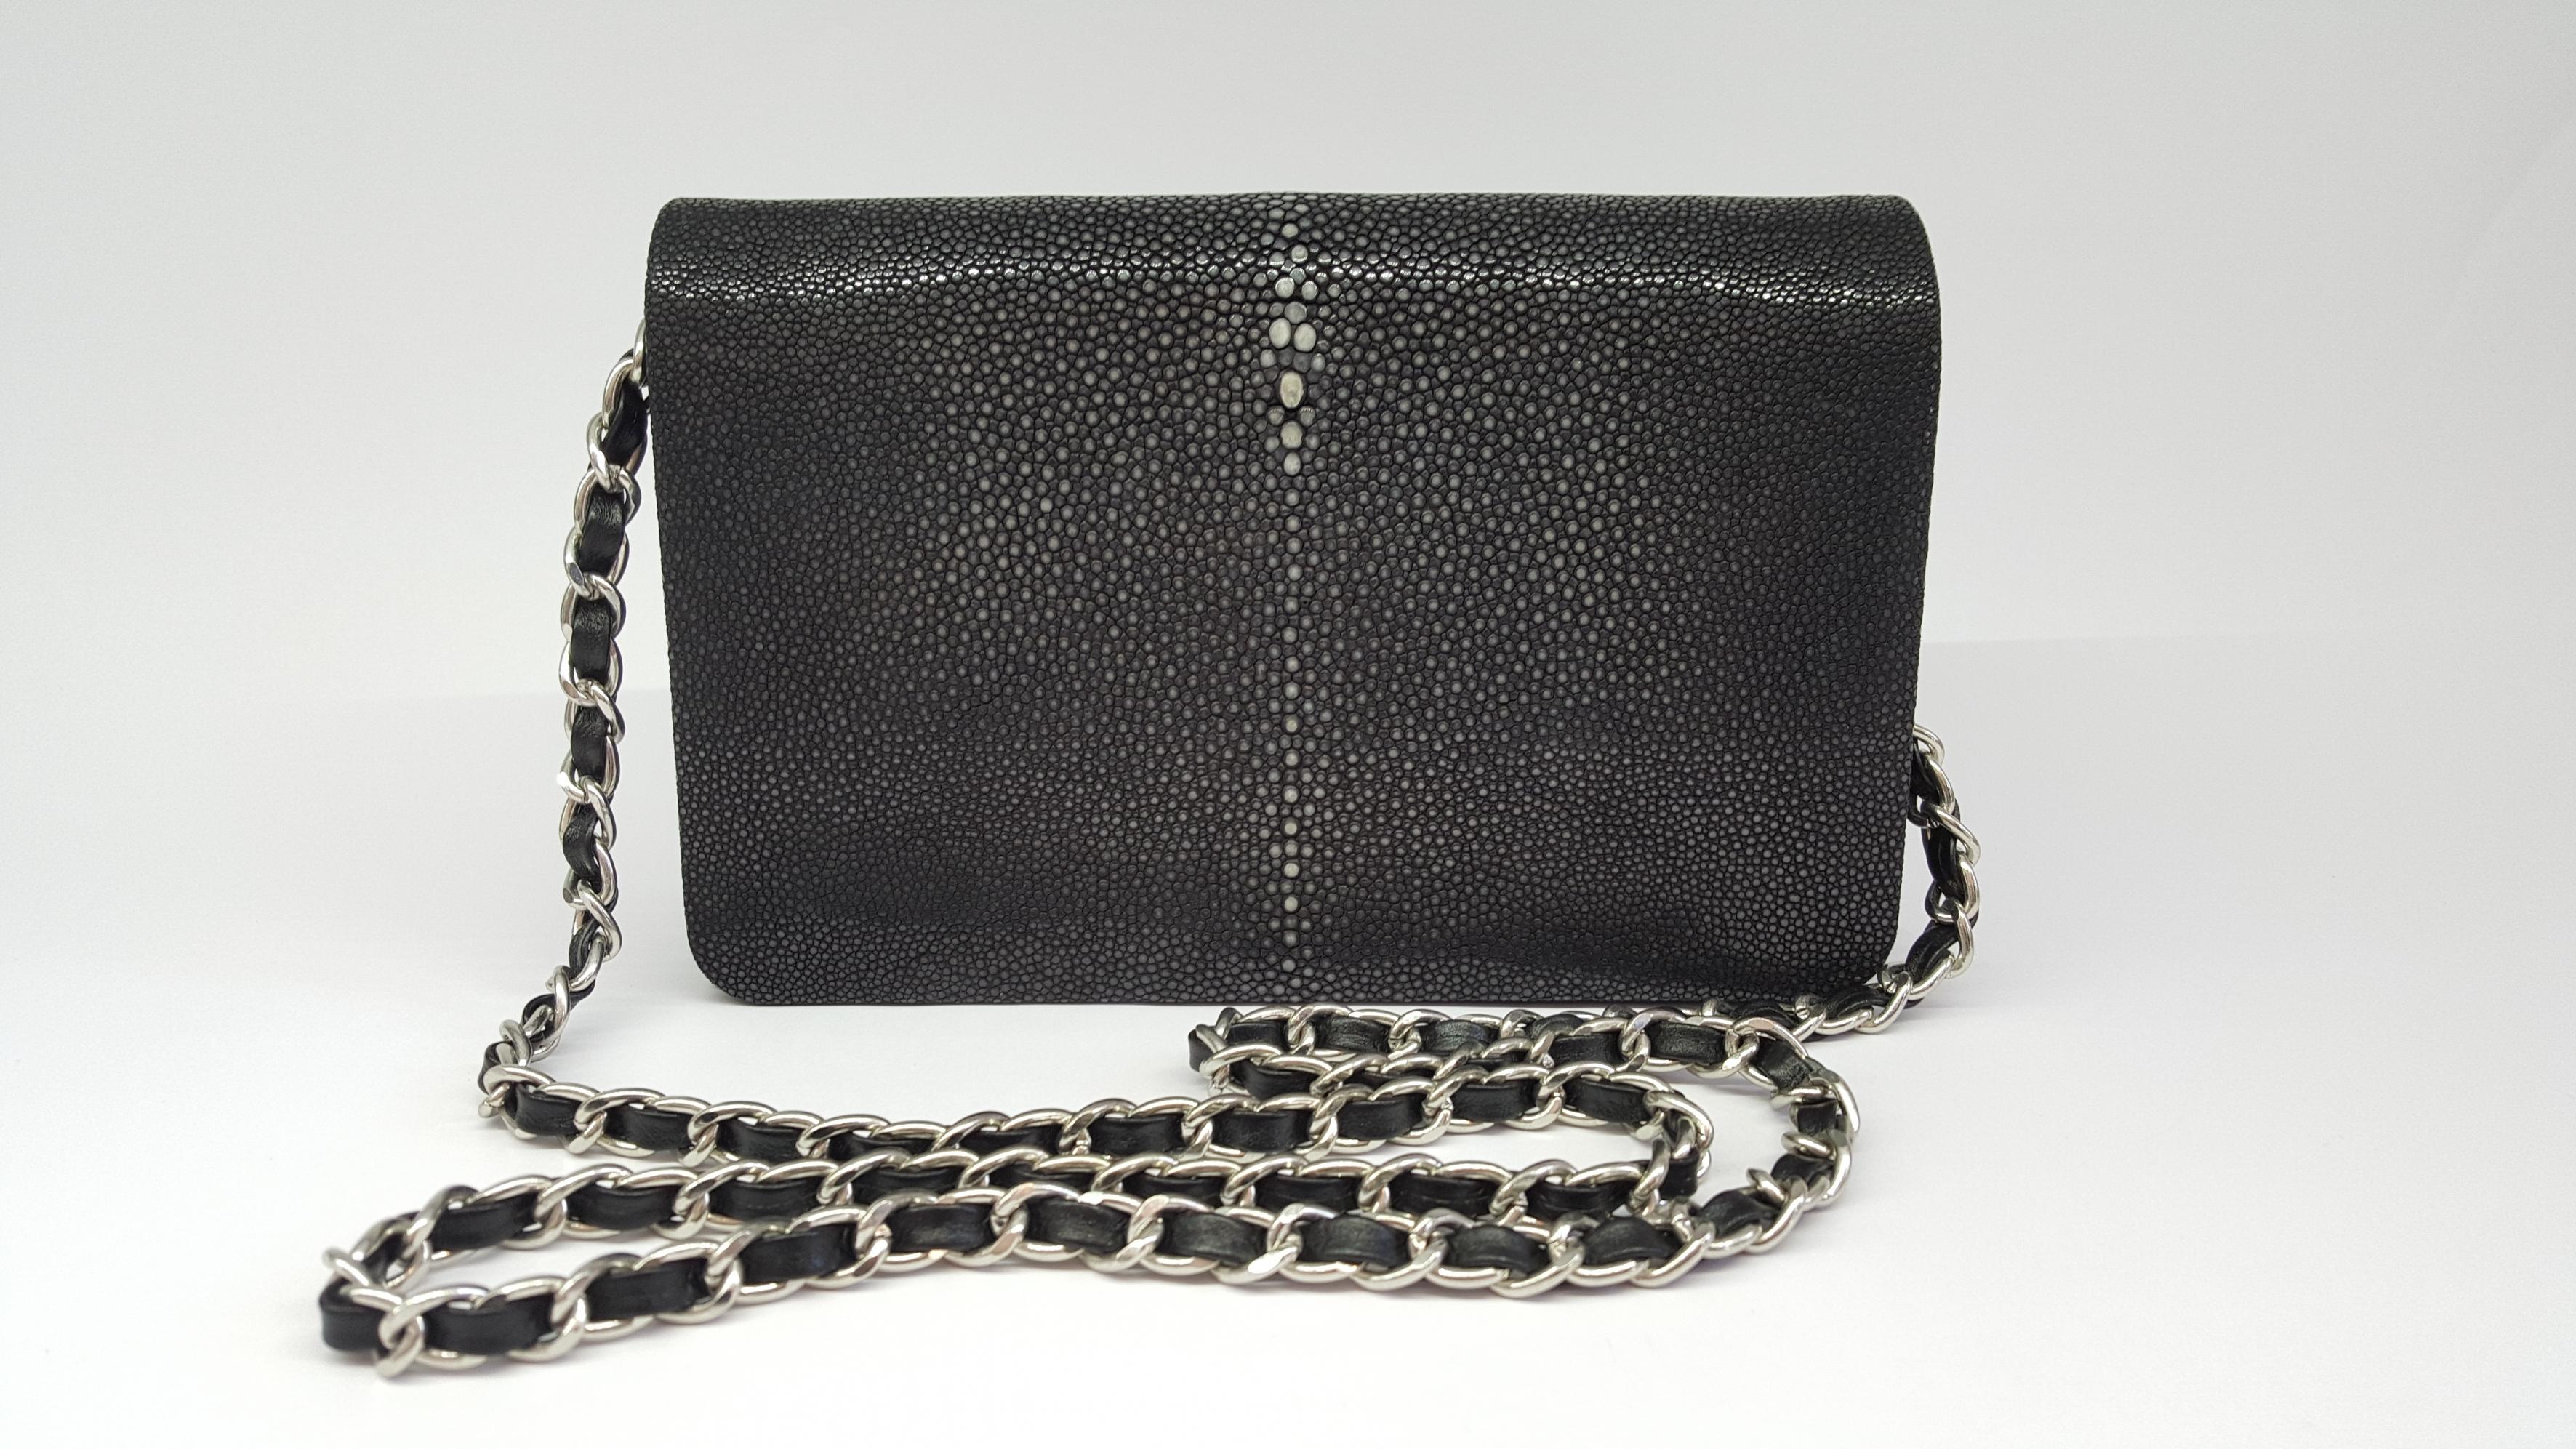 77418175597a Stingray bag small black - Vintage Shop in Mykonos